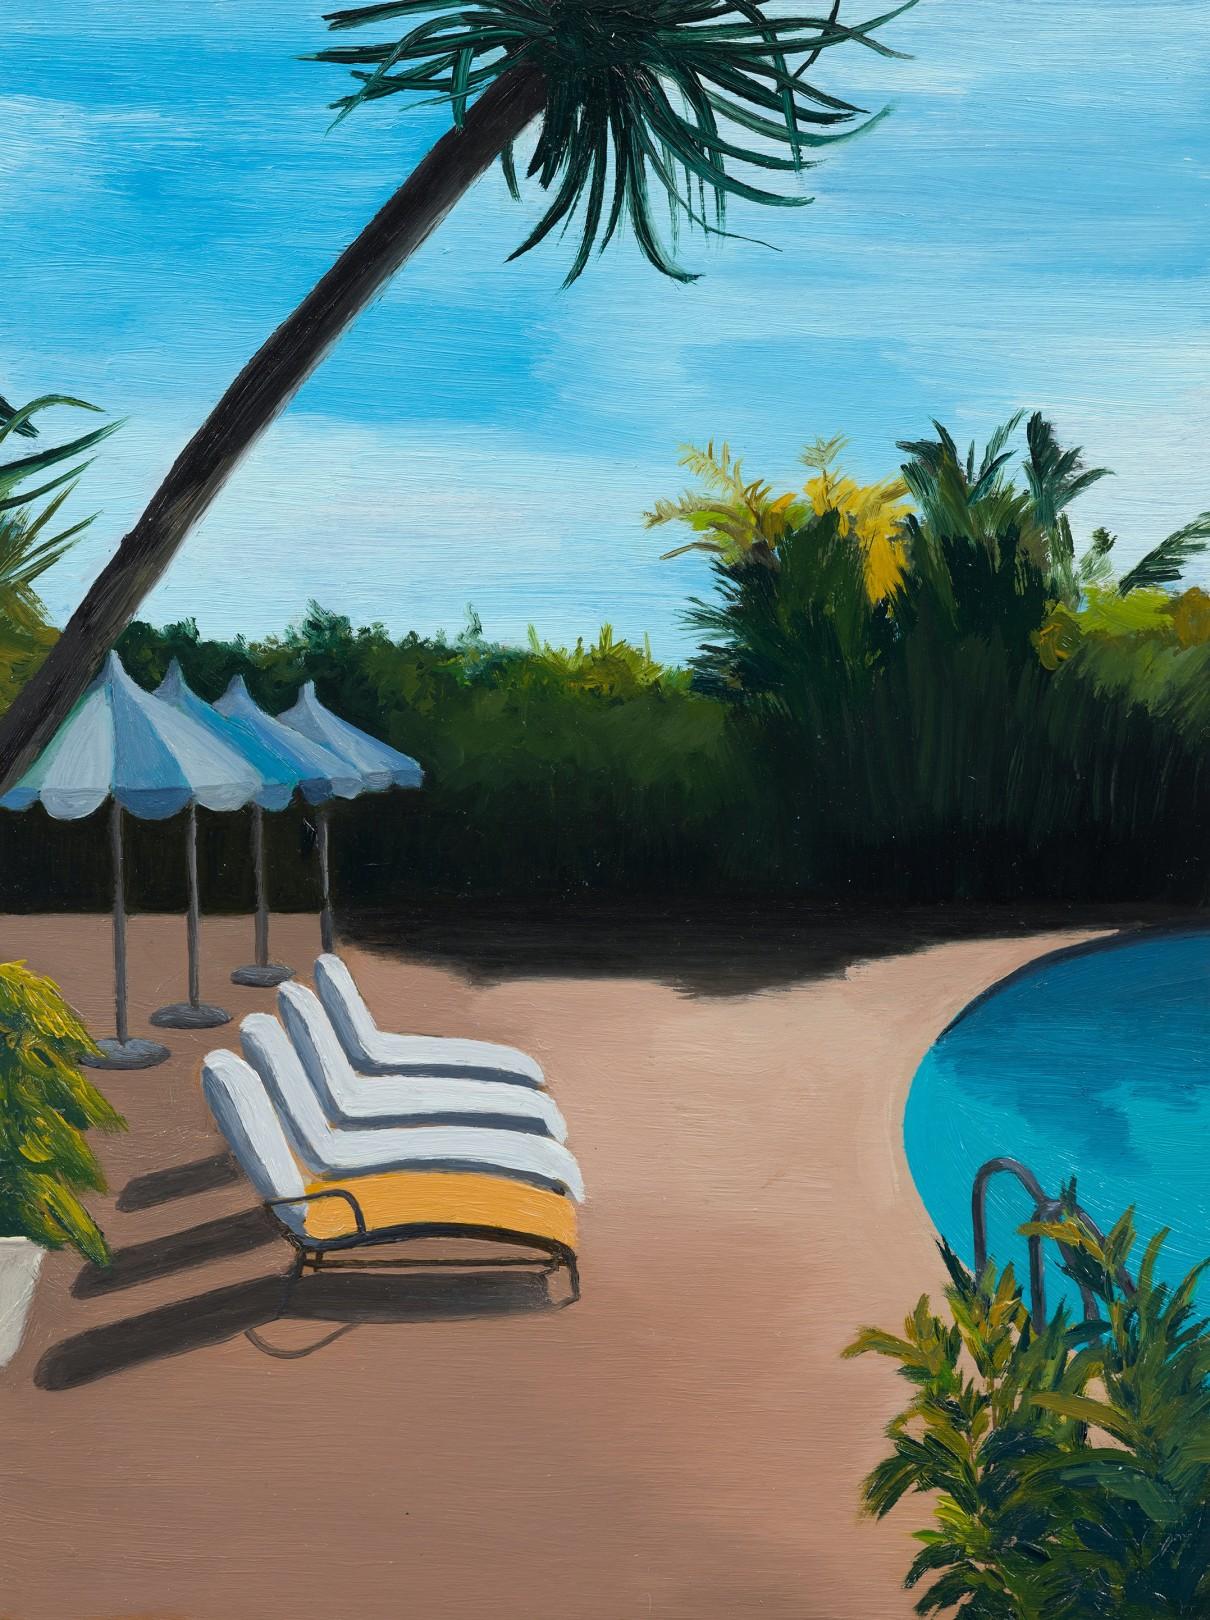 Poolside, 2020 Oil on panel 20 x 15 cm. /8 x 6 in.